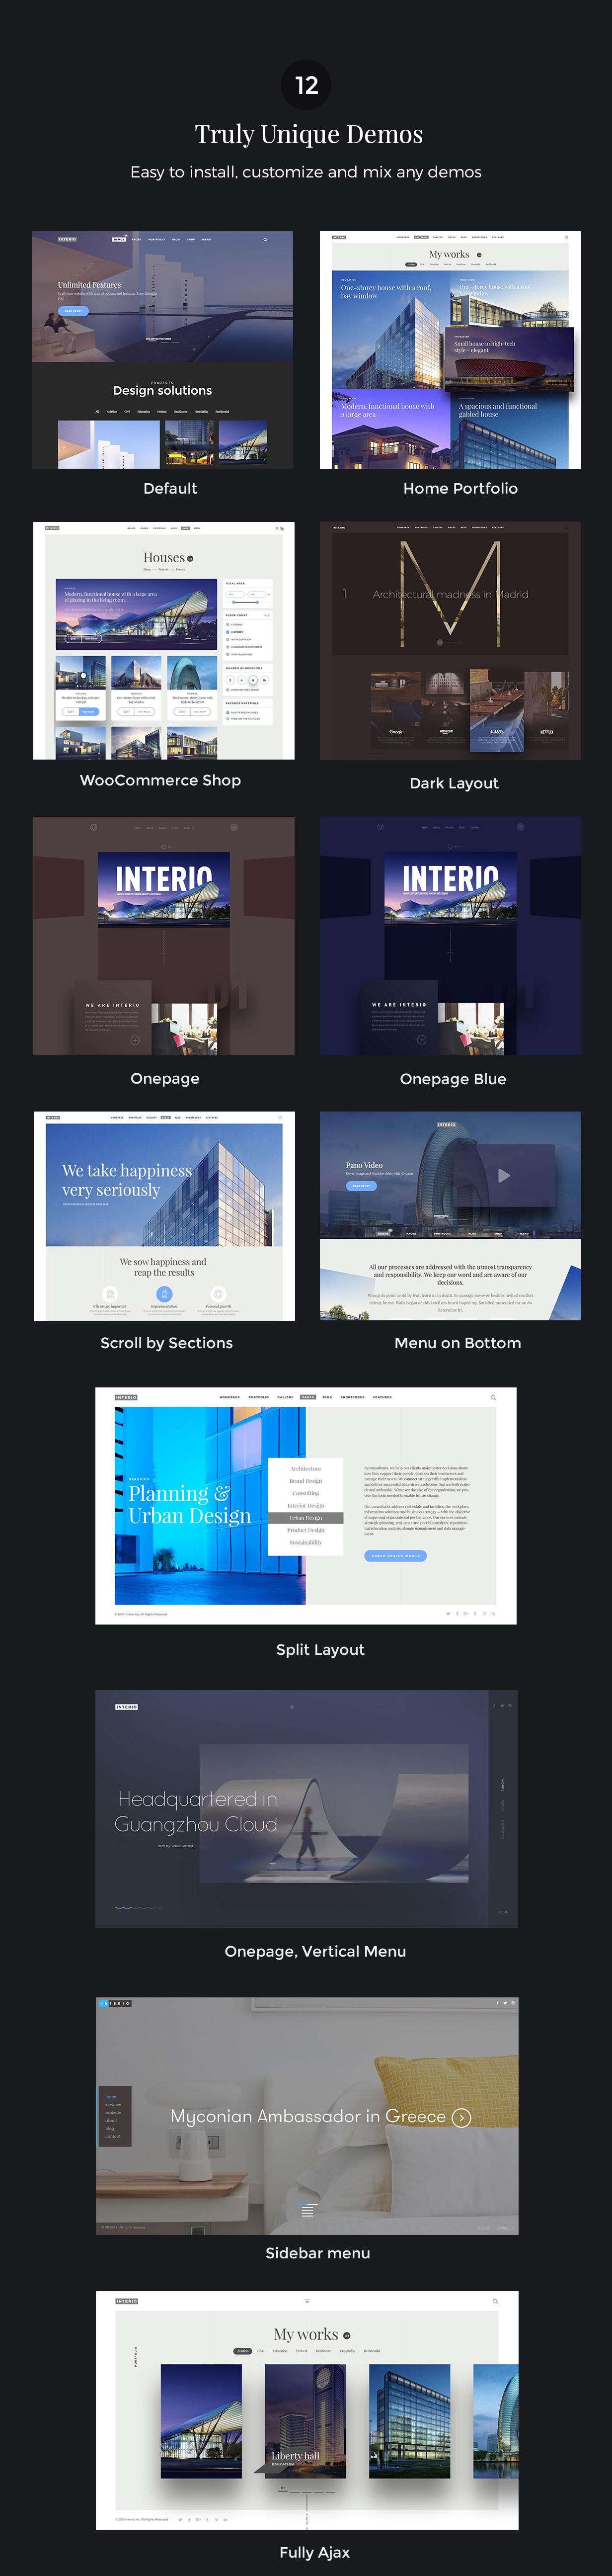 Interio — Architecture WordPress Theme - 4